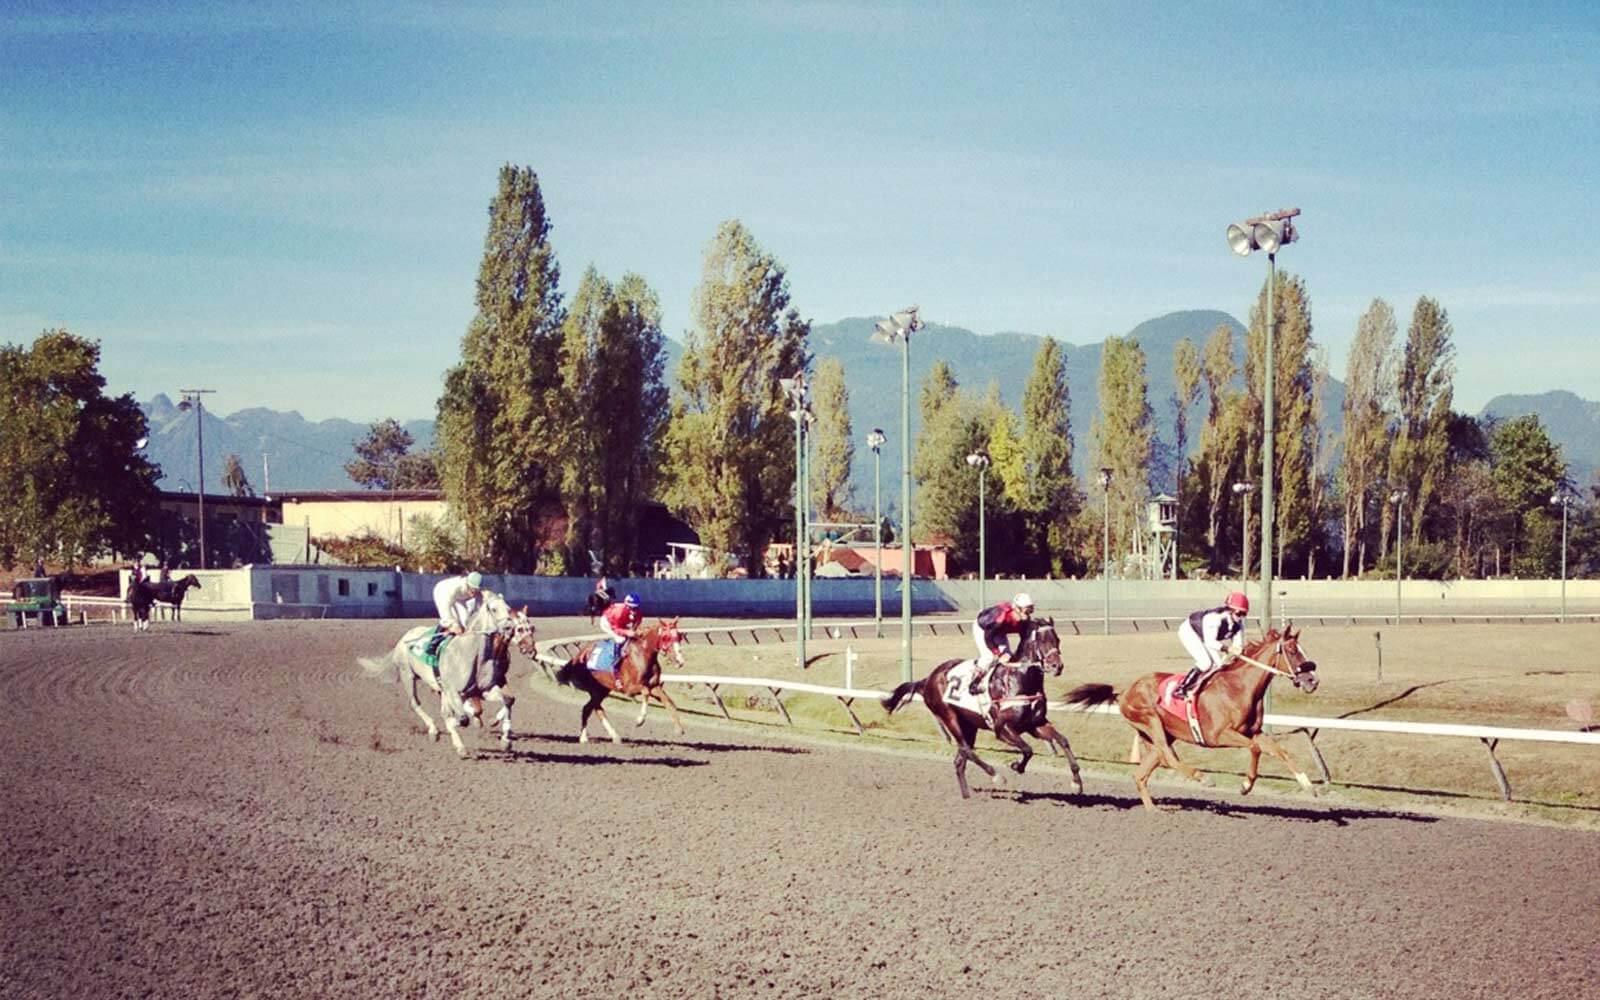 Pferderennen-British-Columbia-Kanada